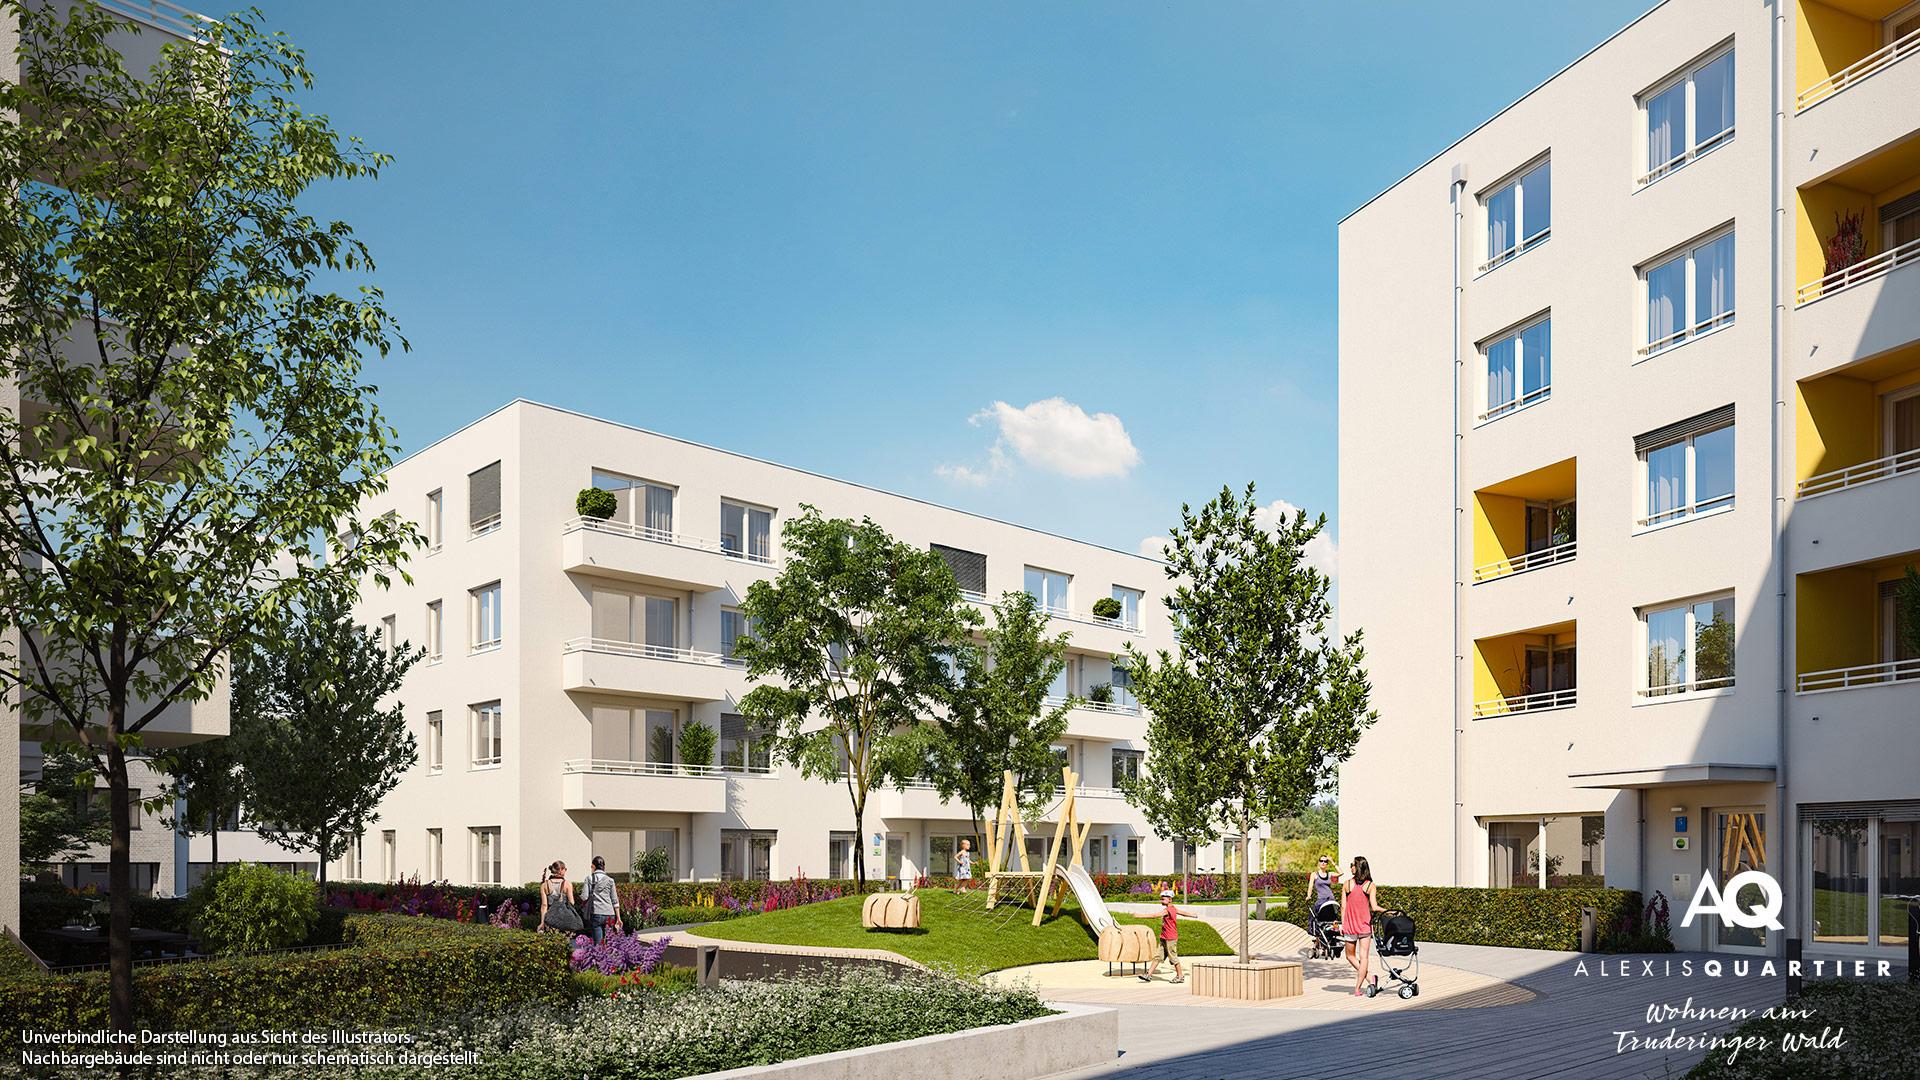 Immobilie Alexisquartier - Wohnen am Truderinger Wald - Illustration 4